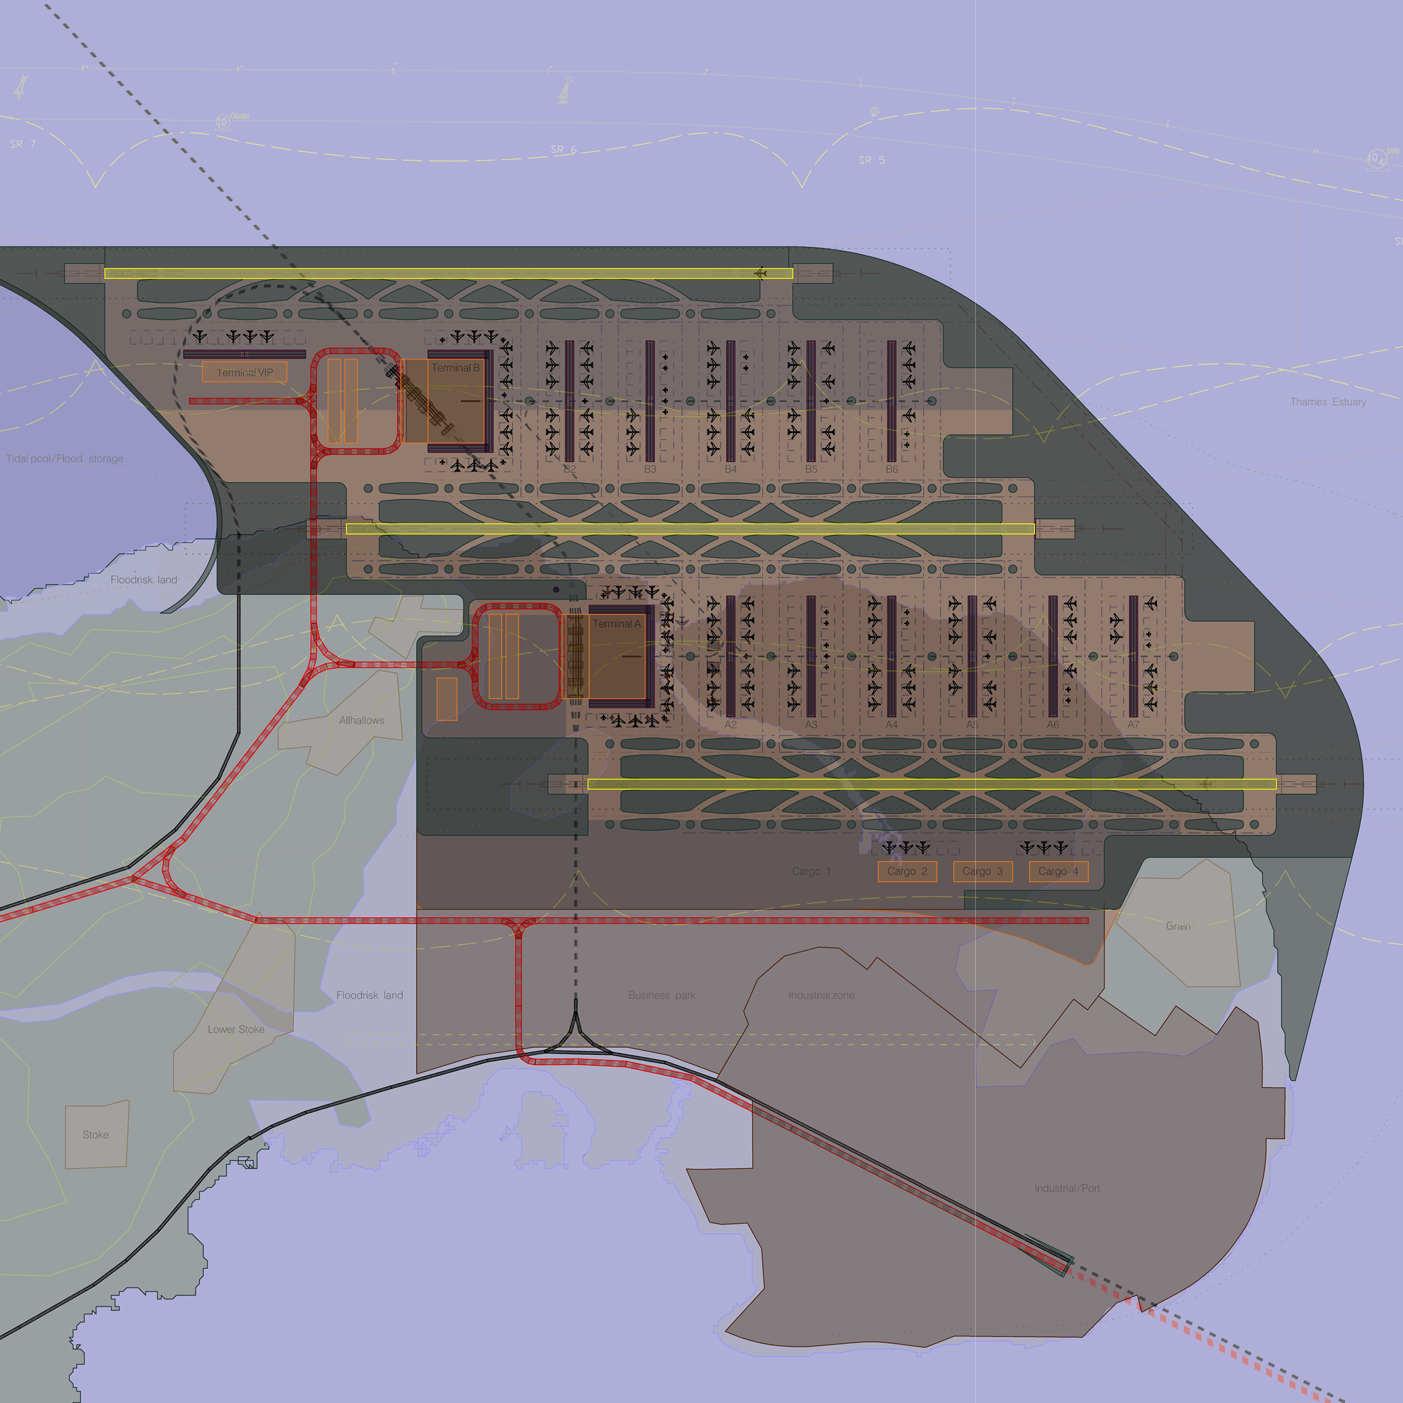 http://www.thamesreachairport.com/wp-content/uploads/2013/06/TRA_platform_layout3.png